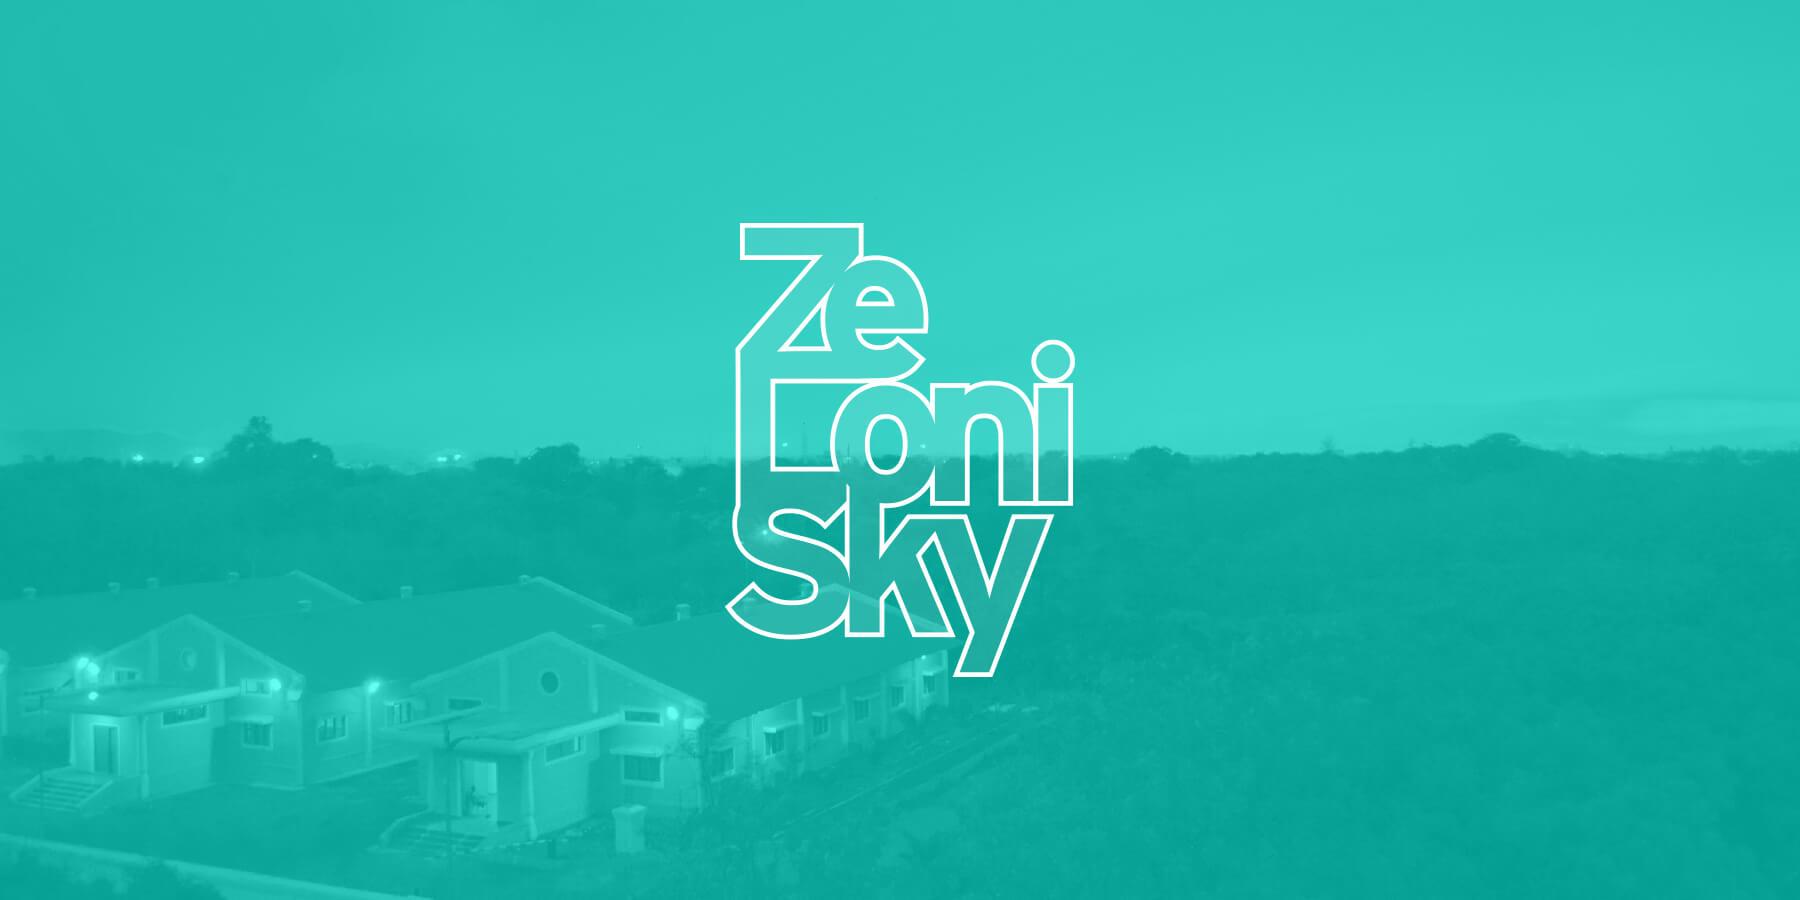 ZeLoniSky